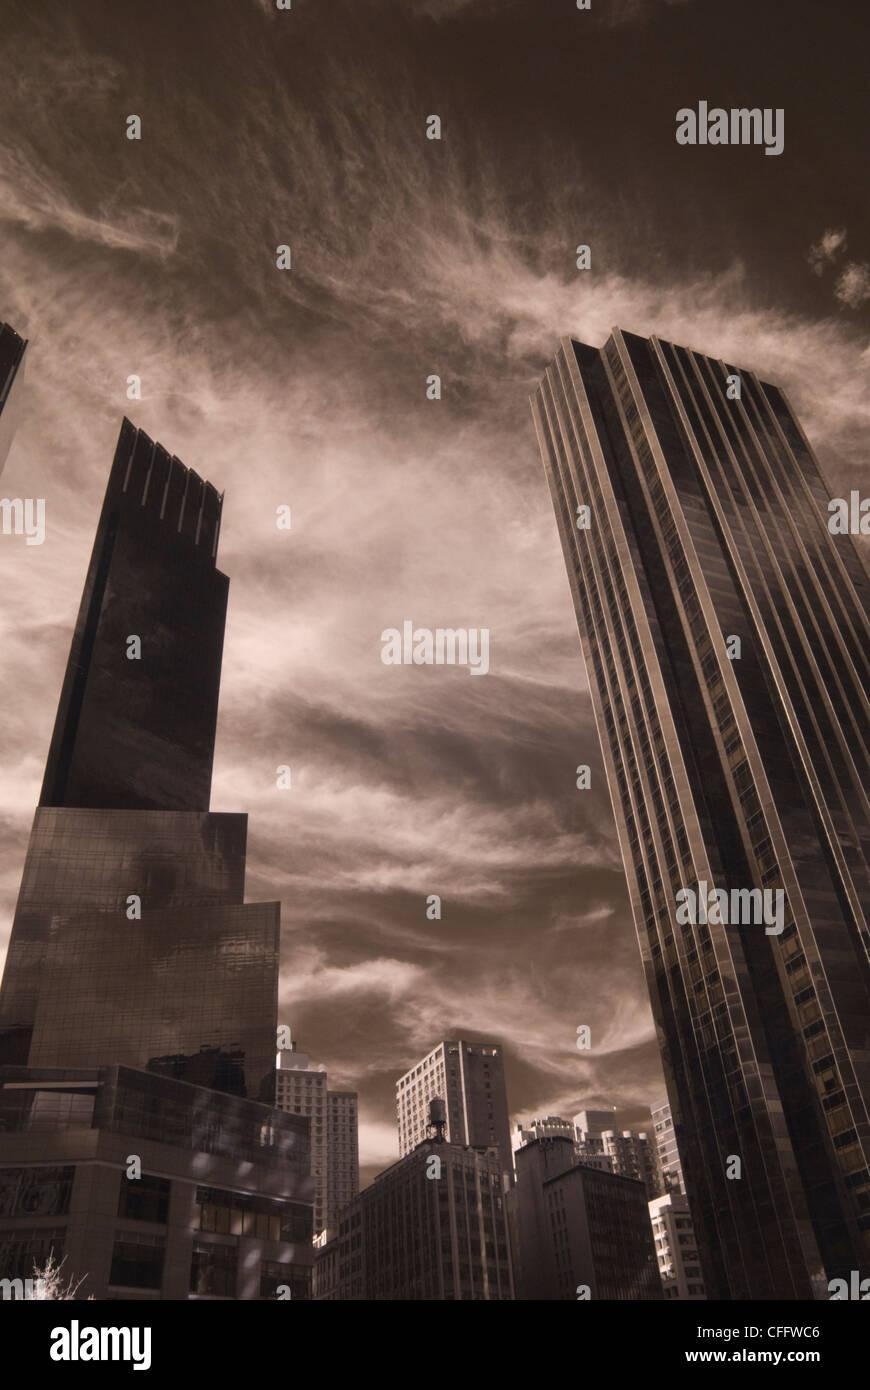 Skyscrapers Against Black Sky - Stock Image